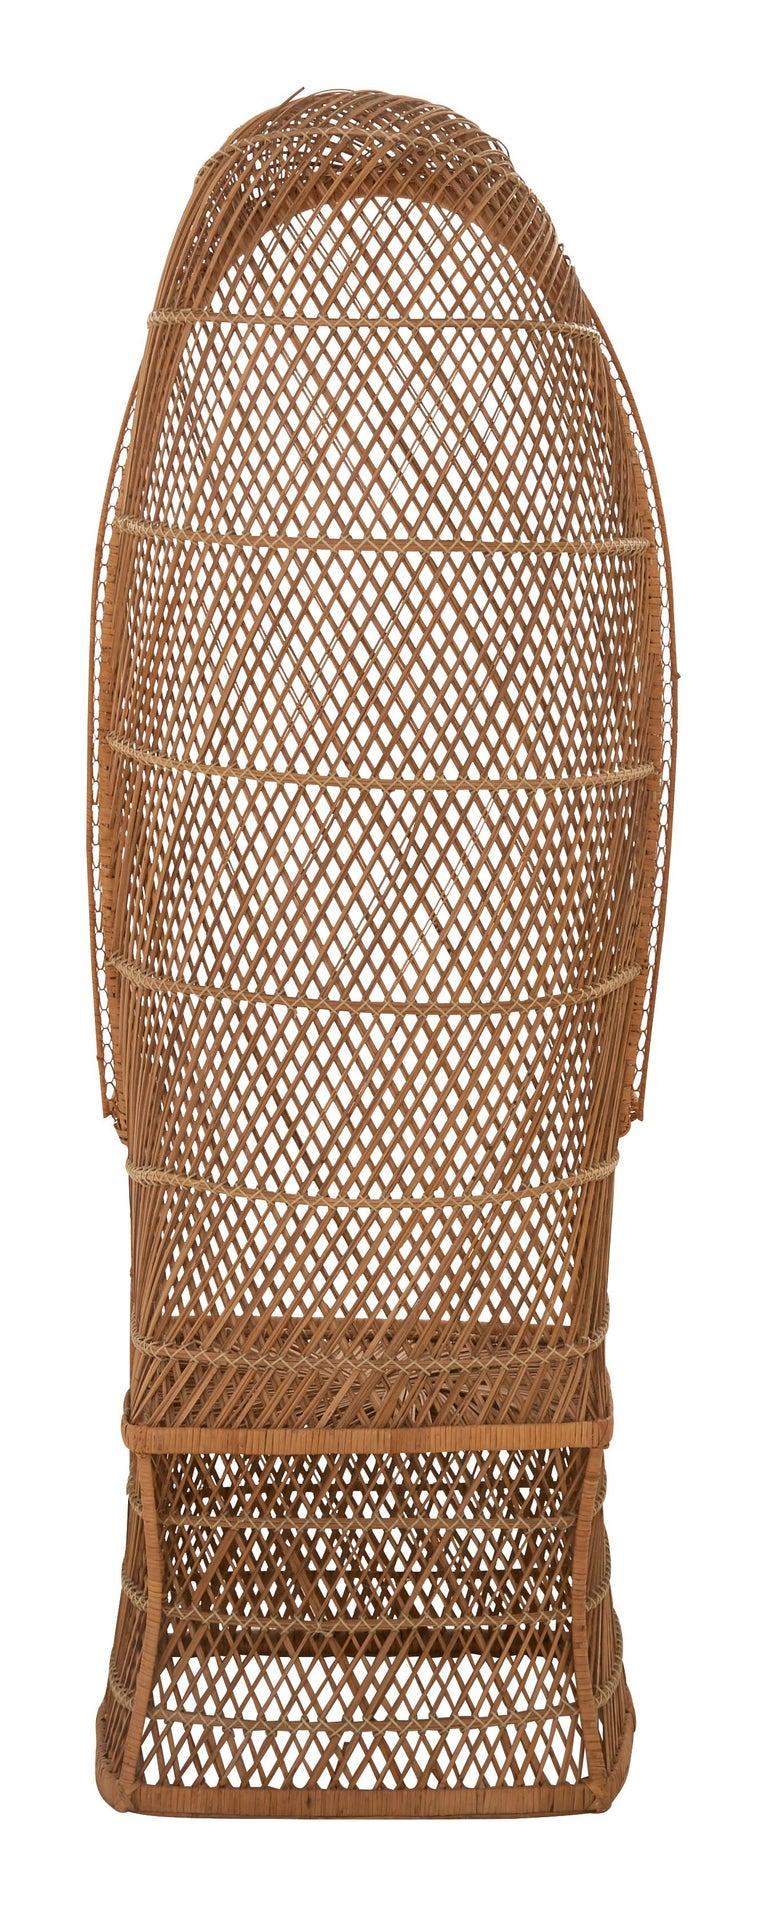 American Midcentury Hooded Rattan Armchair For Sale